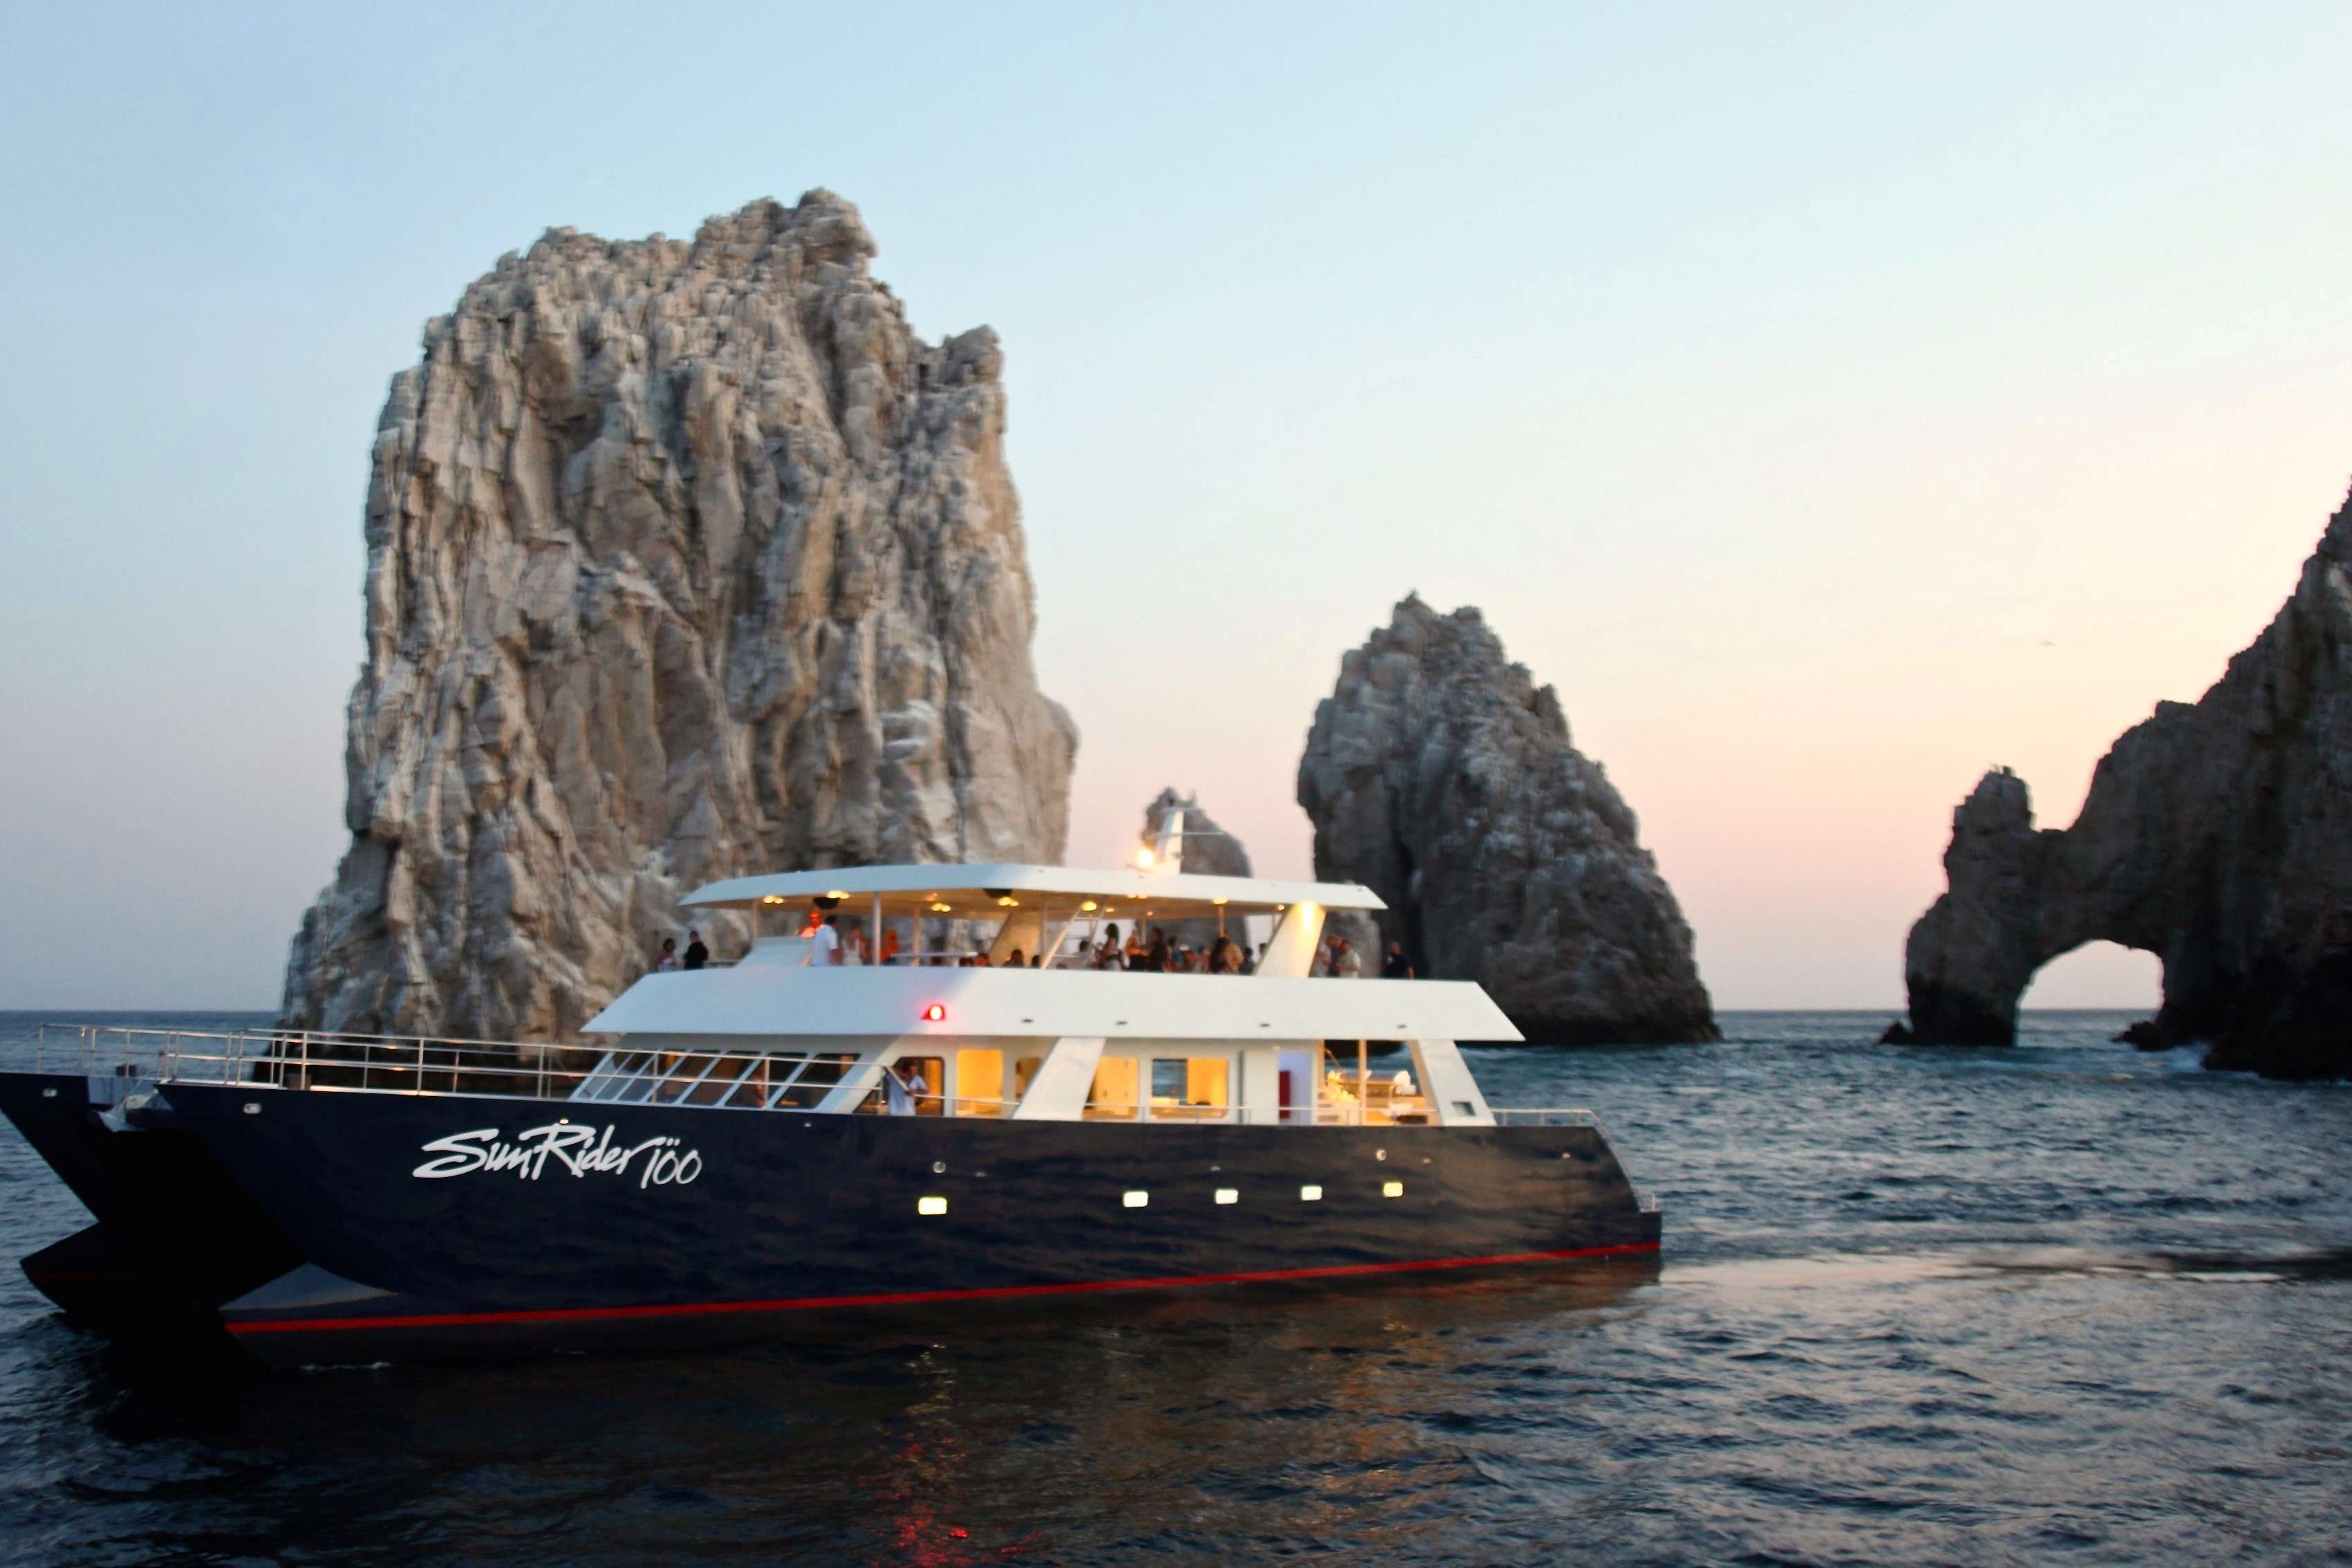 Sunset Cruising Restaurant - Last Minute Tours in Los Cabos